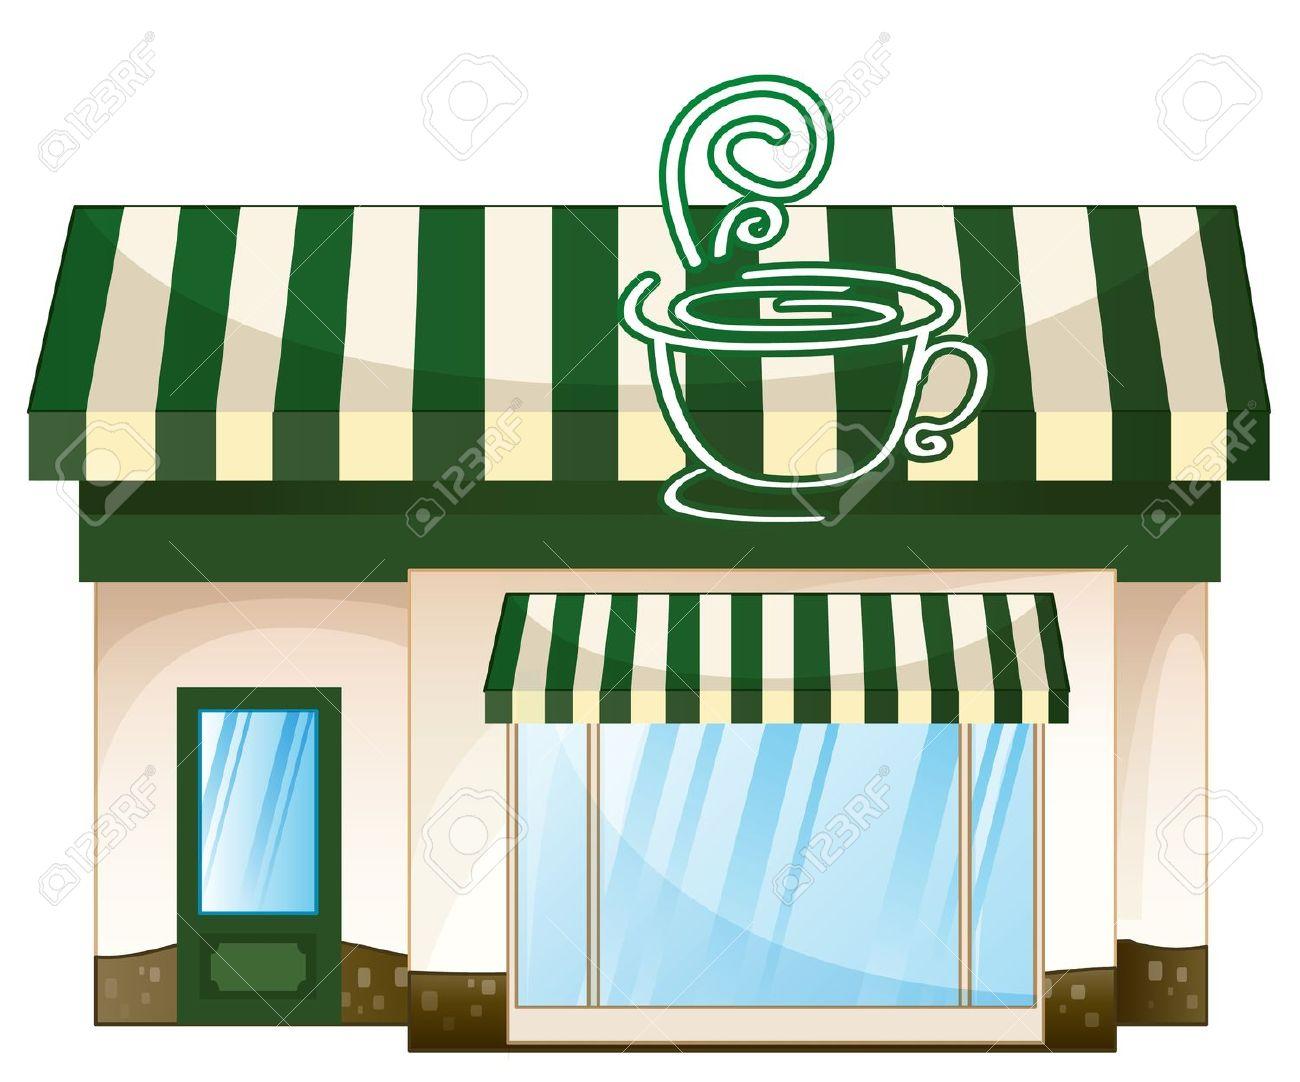 Restaurant clipart cafe building 0360f40829fd1a4c9ac7e9acab298e Clipart Coffee clipart Collection